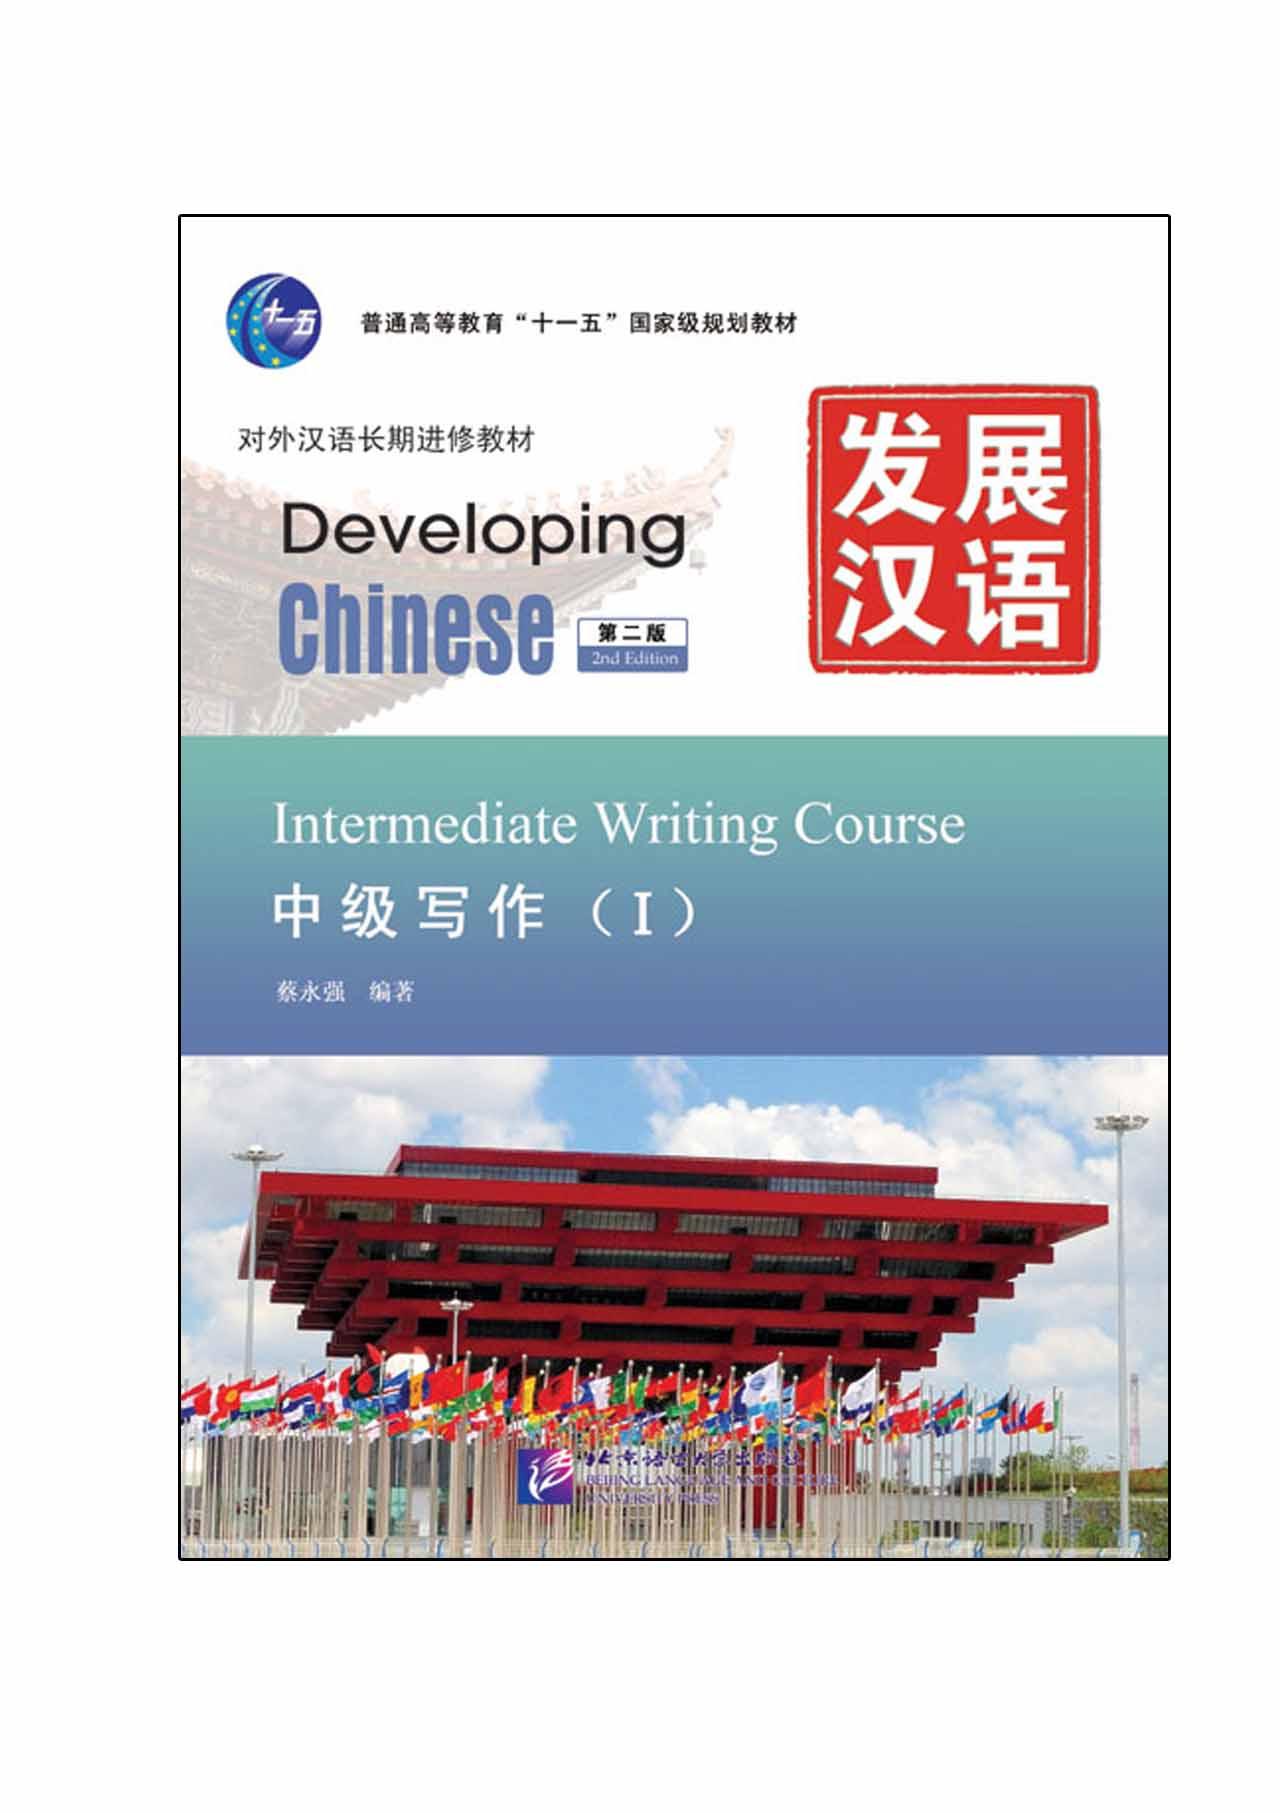 Developing Chinese (2nd Edition) Intermediate Writing Course Ⅰ发展汉语(第2版)中级写作(Ⅰ)